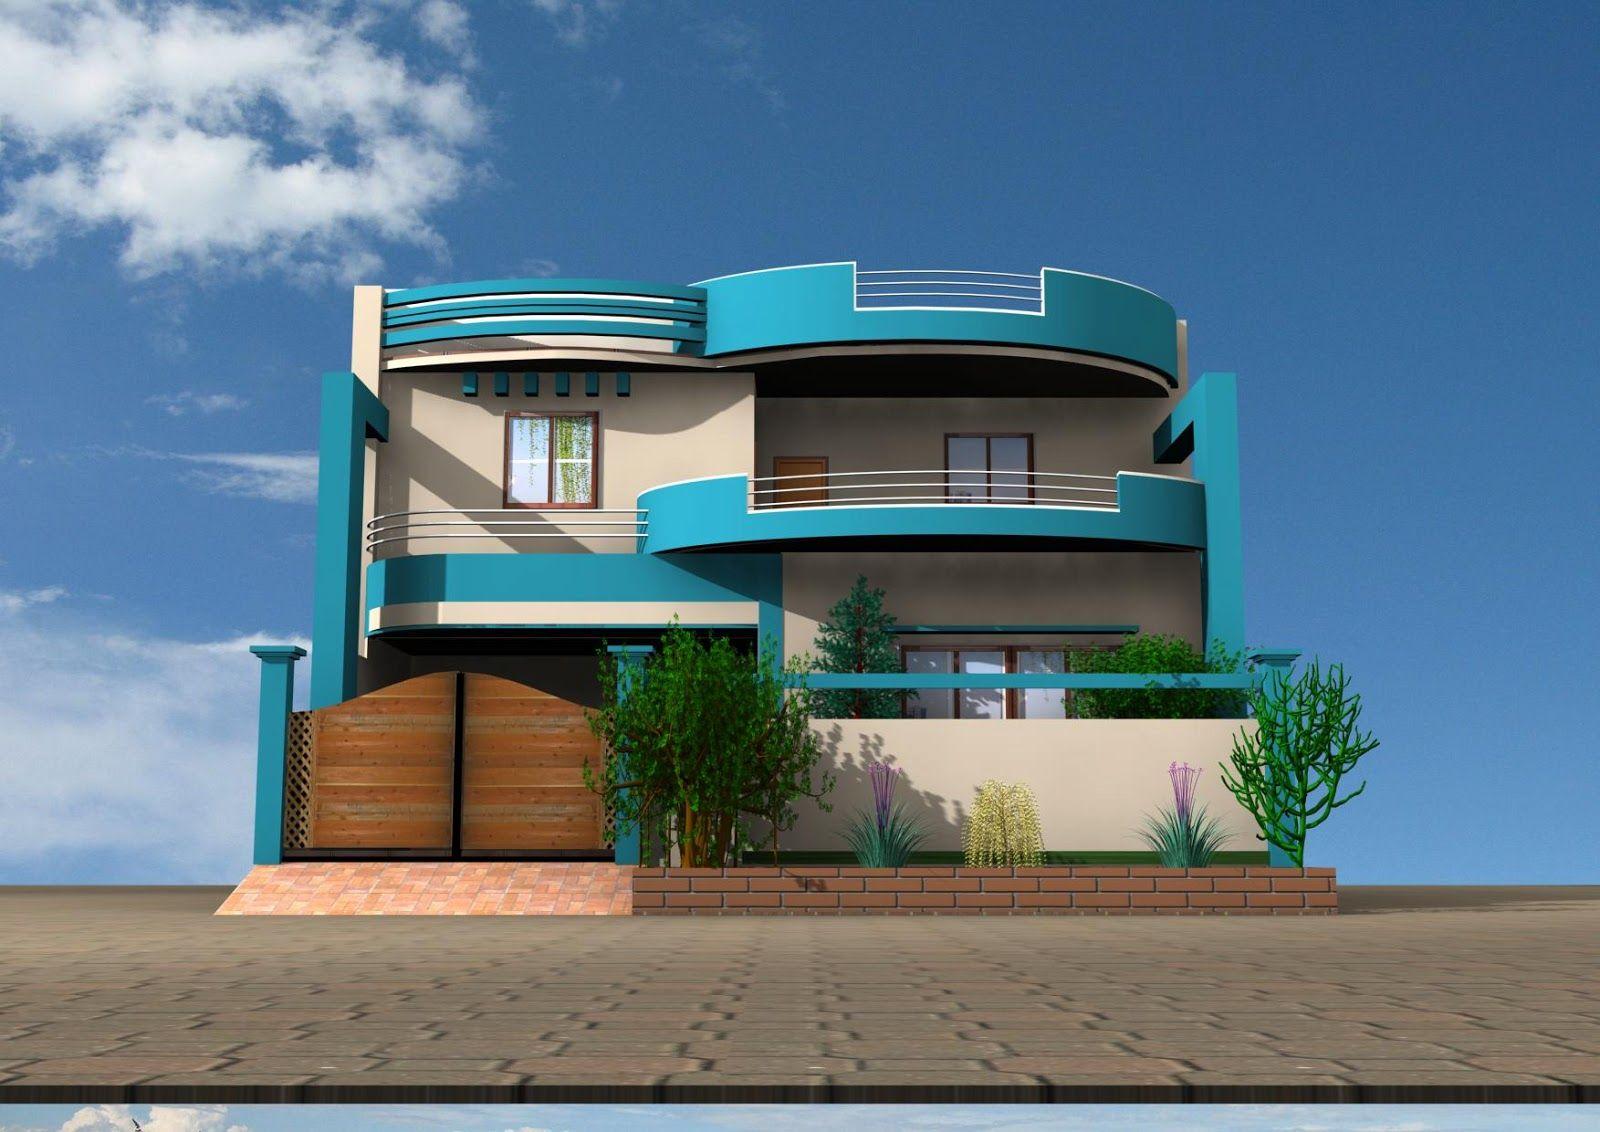 Amazing 17 Best Images About Exterior On Pinterest House Design Villas Largest Home Design Picture Inspirations Pitcheantrous